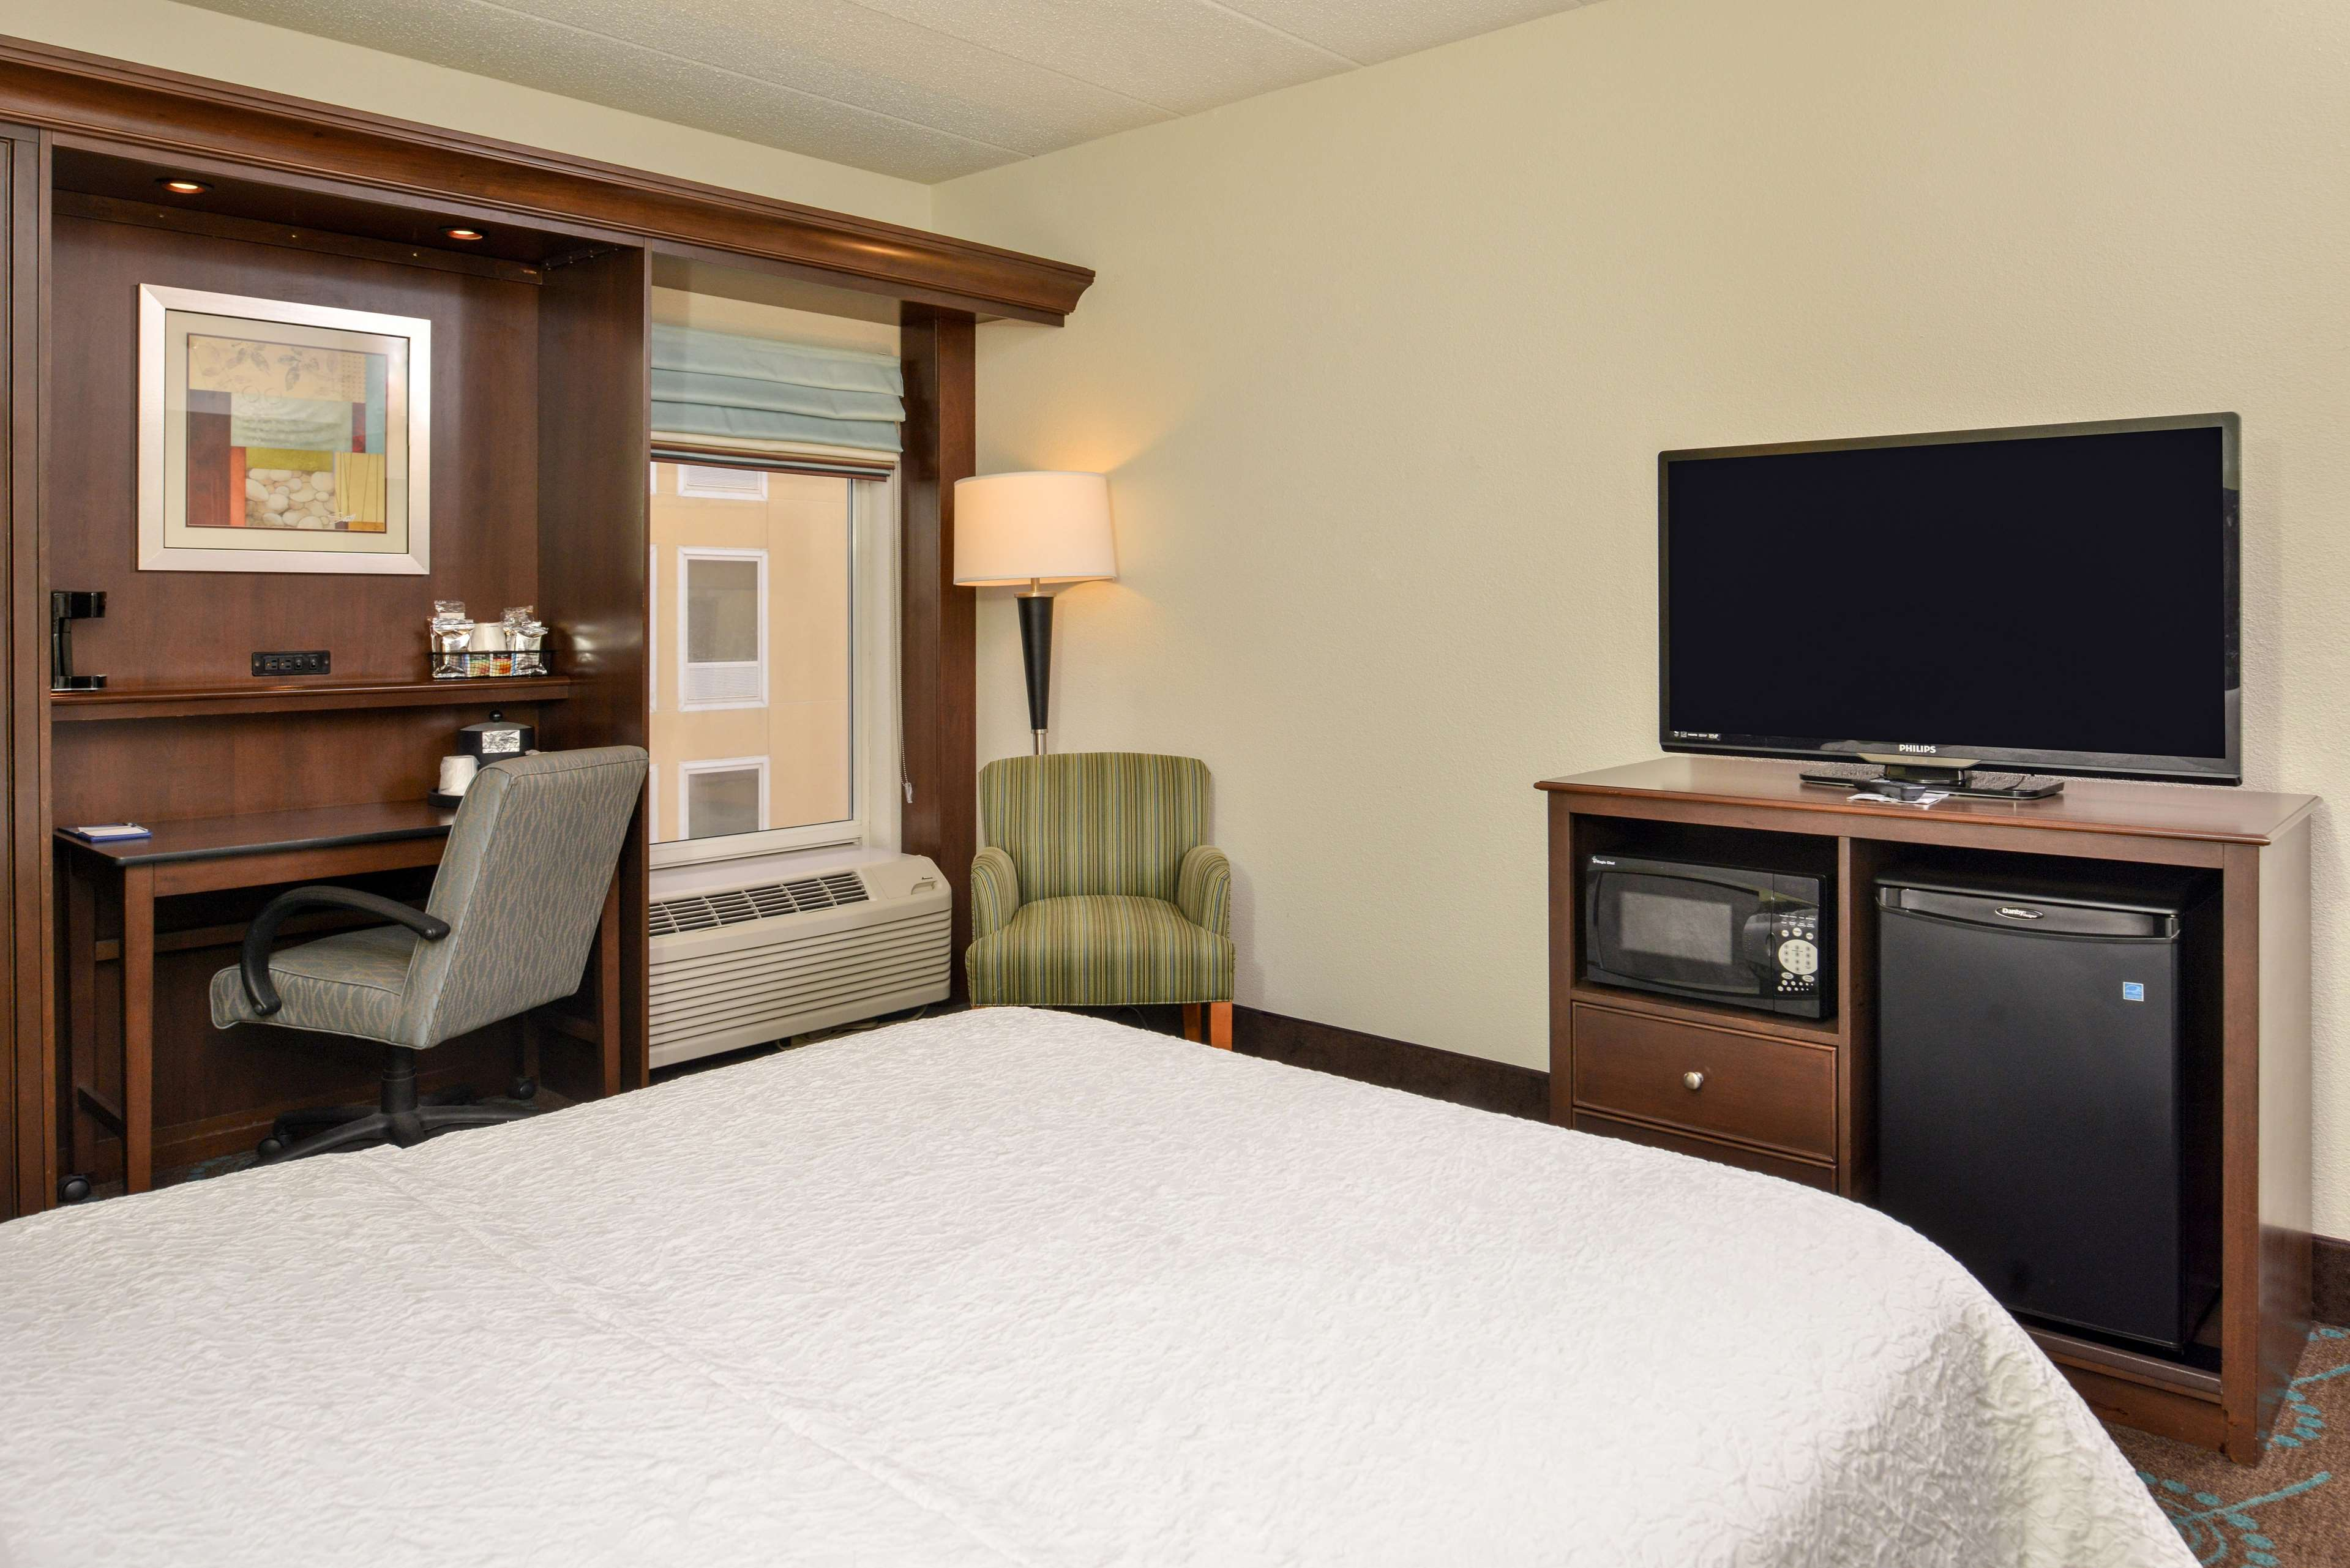 Hampton Inn & Suites Newport News (Oyster Point) image 39